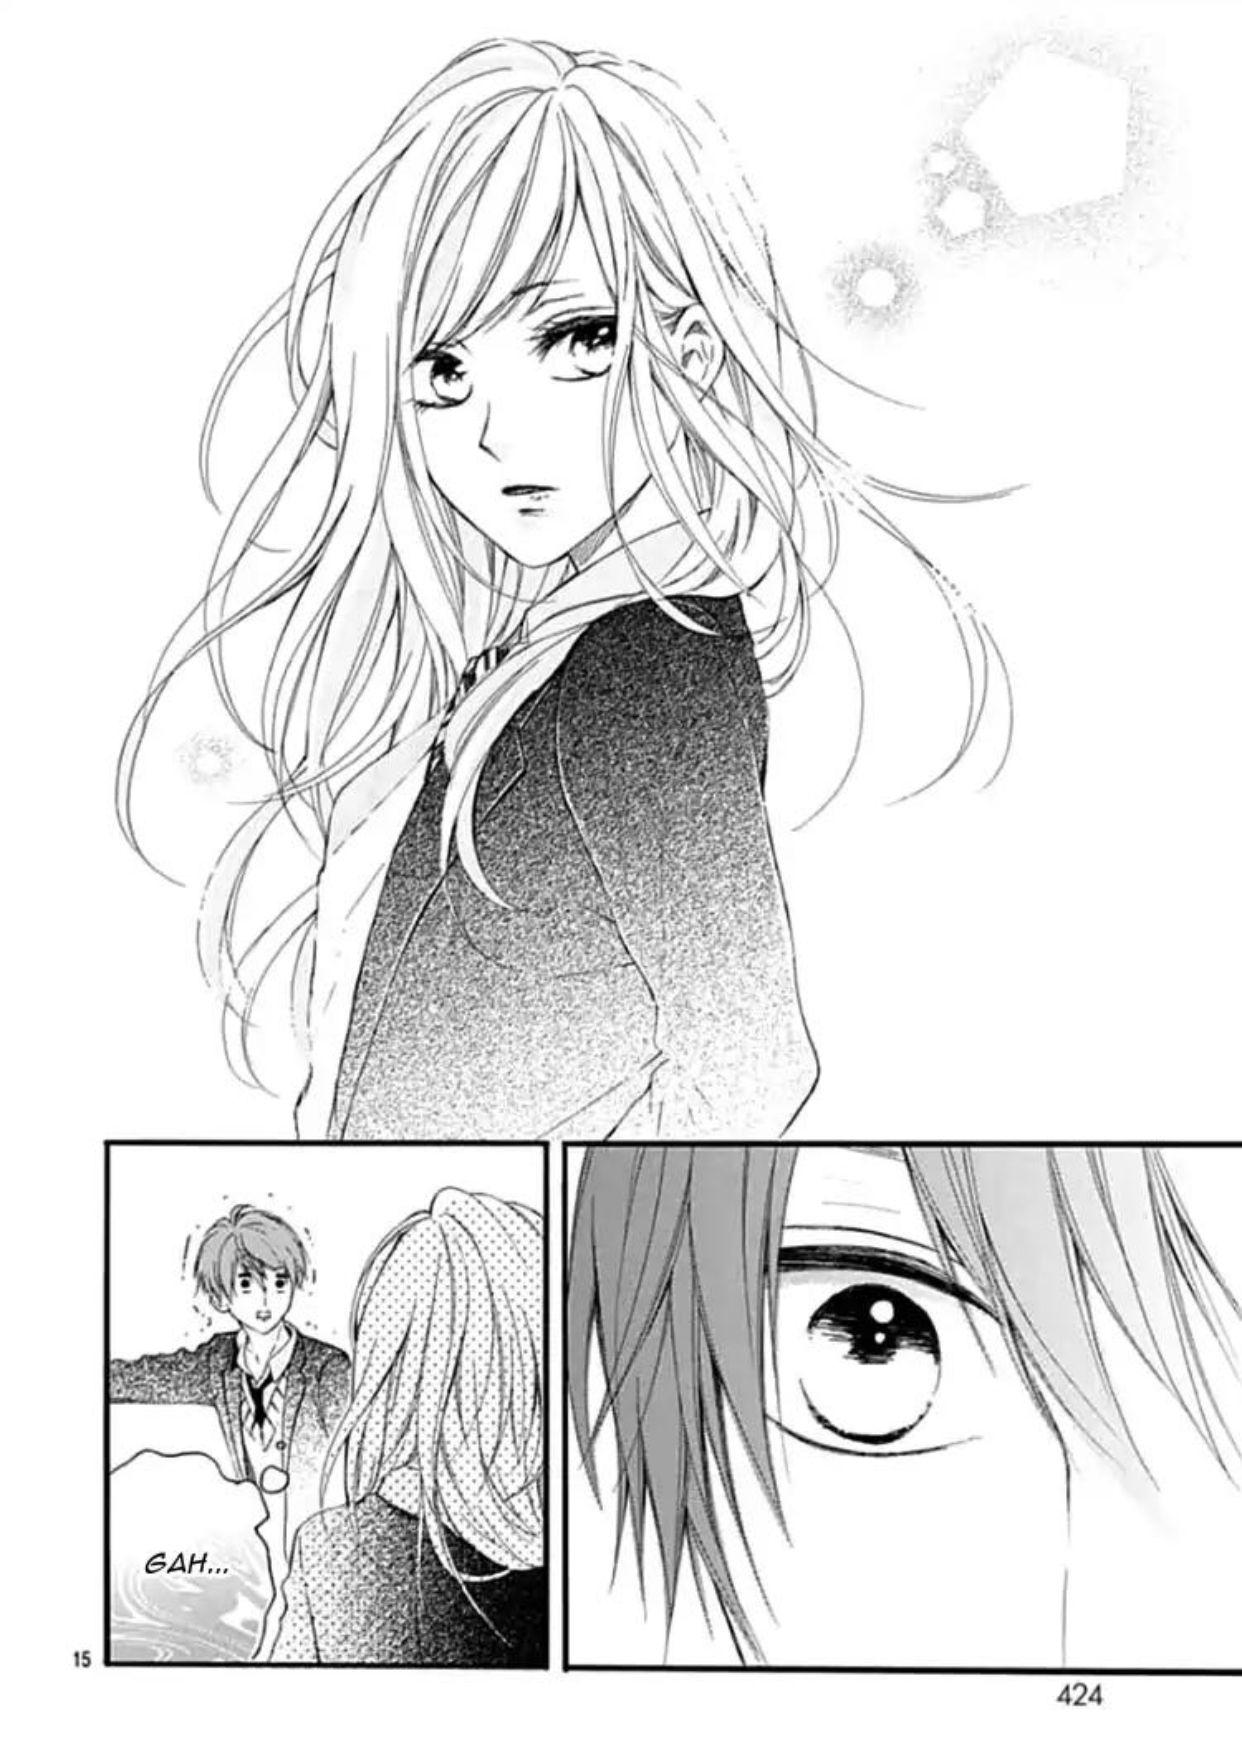 Pin by Animemangaluver on Boku Datte, Kiss Shitai Manga in